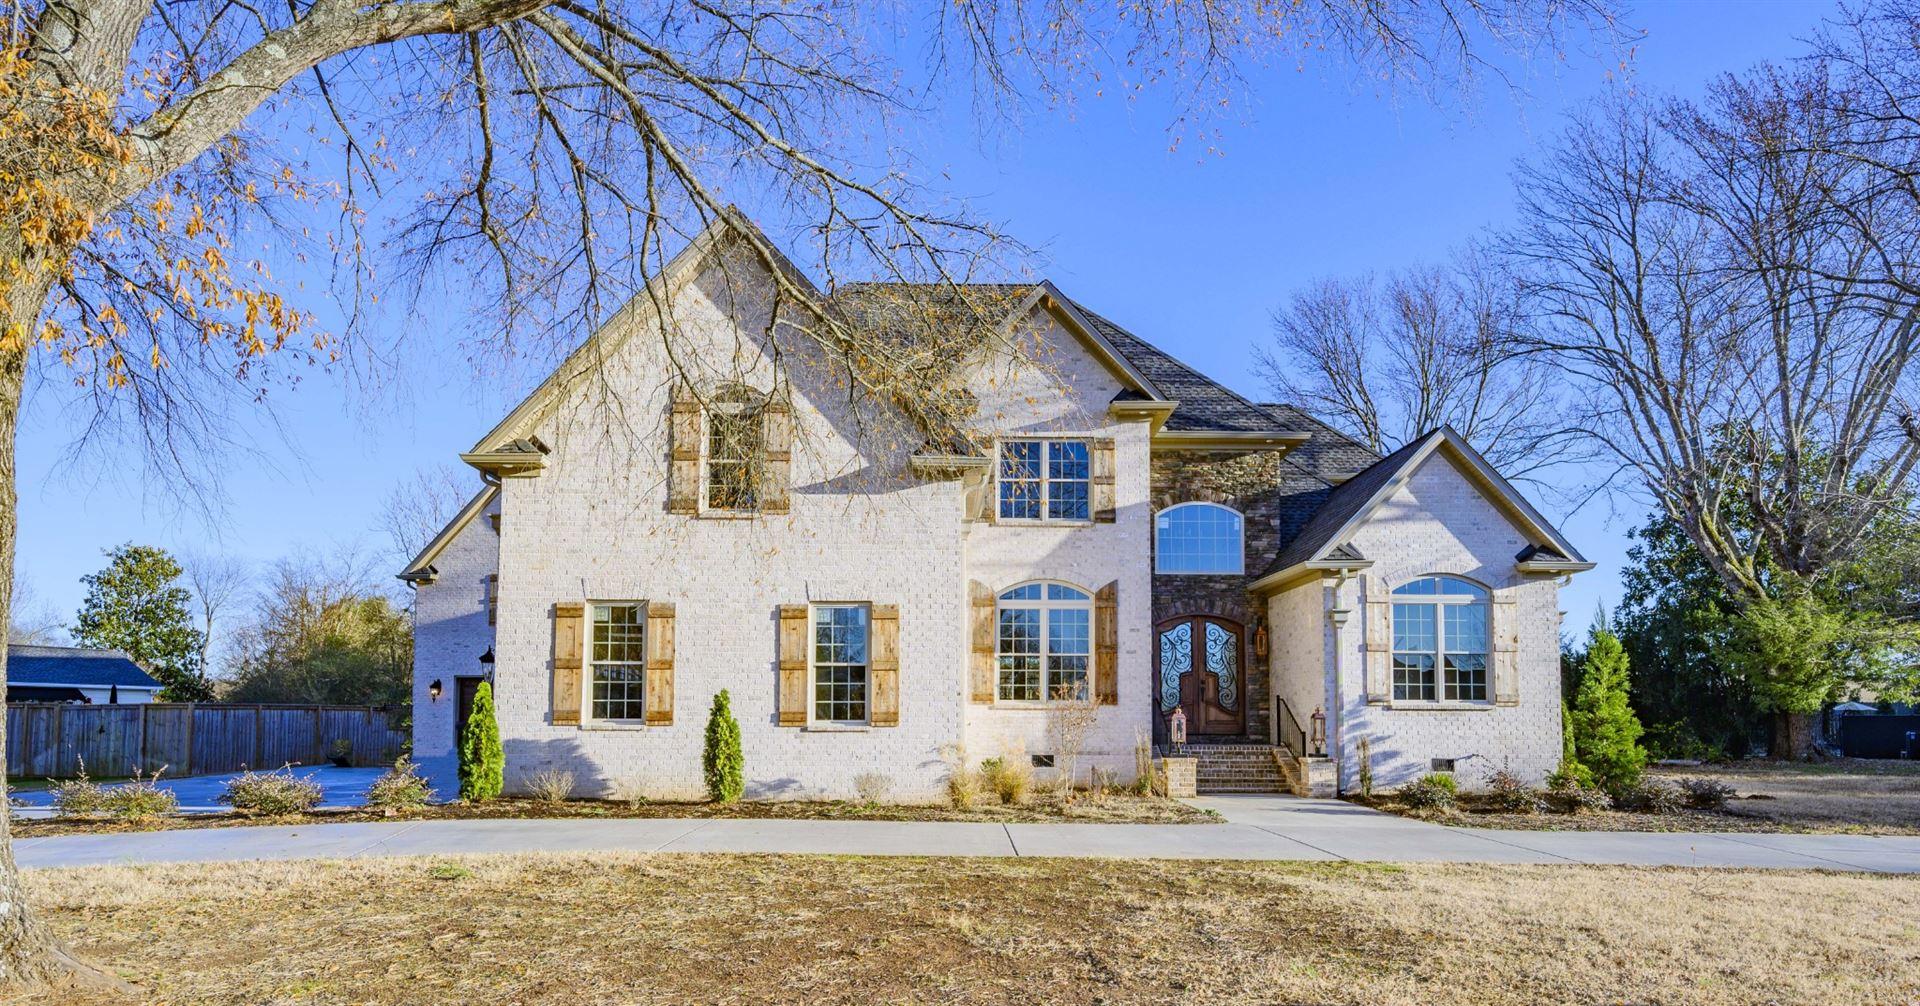 1619 Georgetown Lane, Murfreesboro, TN 37129 - MLS#: 2215609